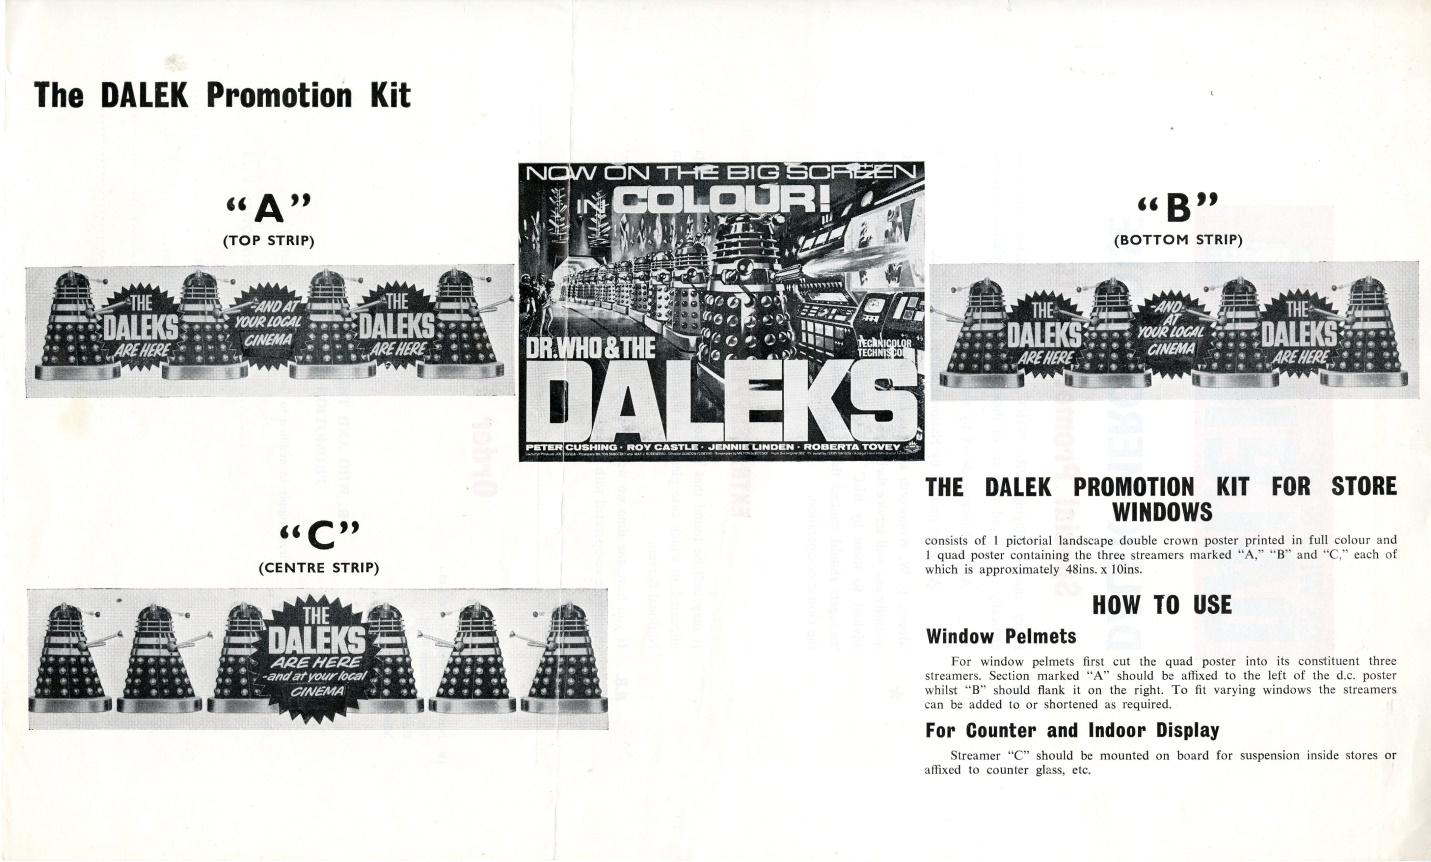 National Screen Service Dalek merchandise promotion kit flier (back)